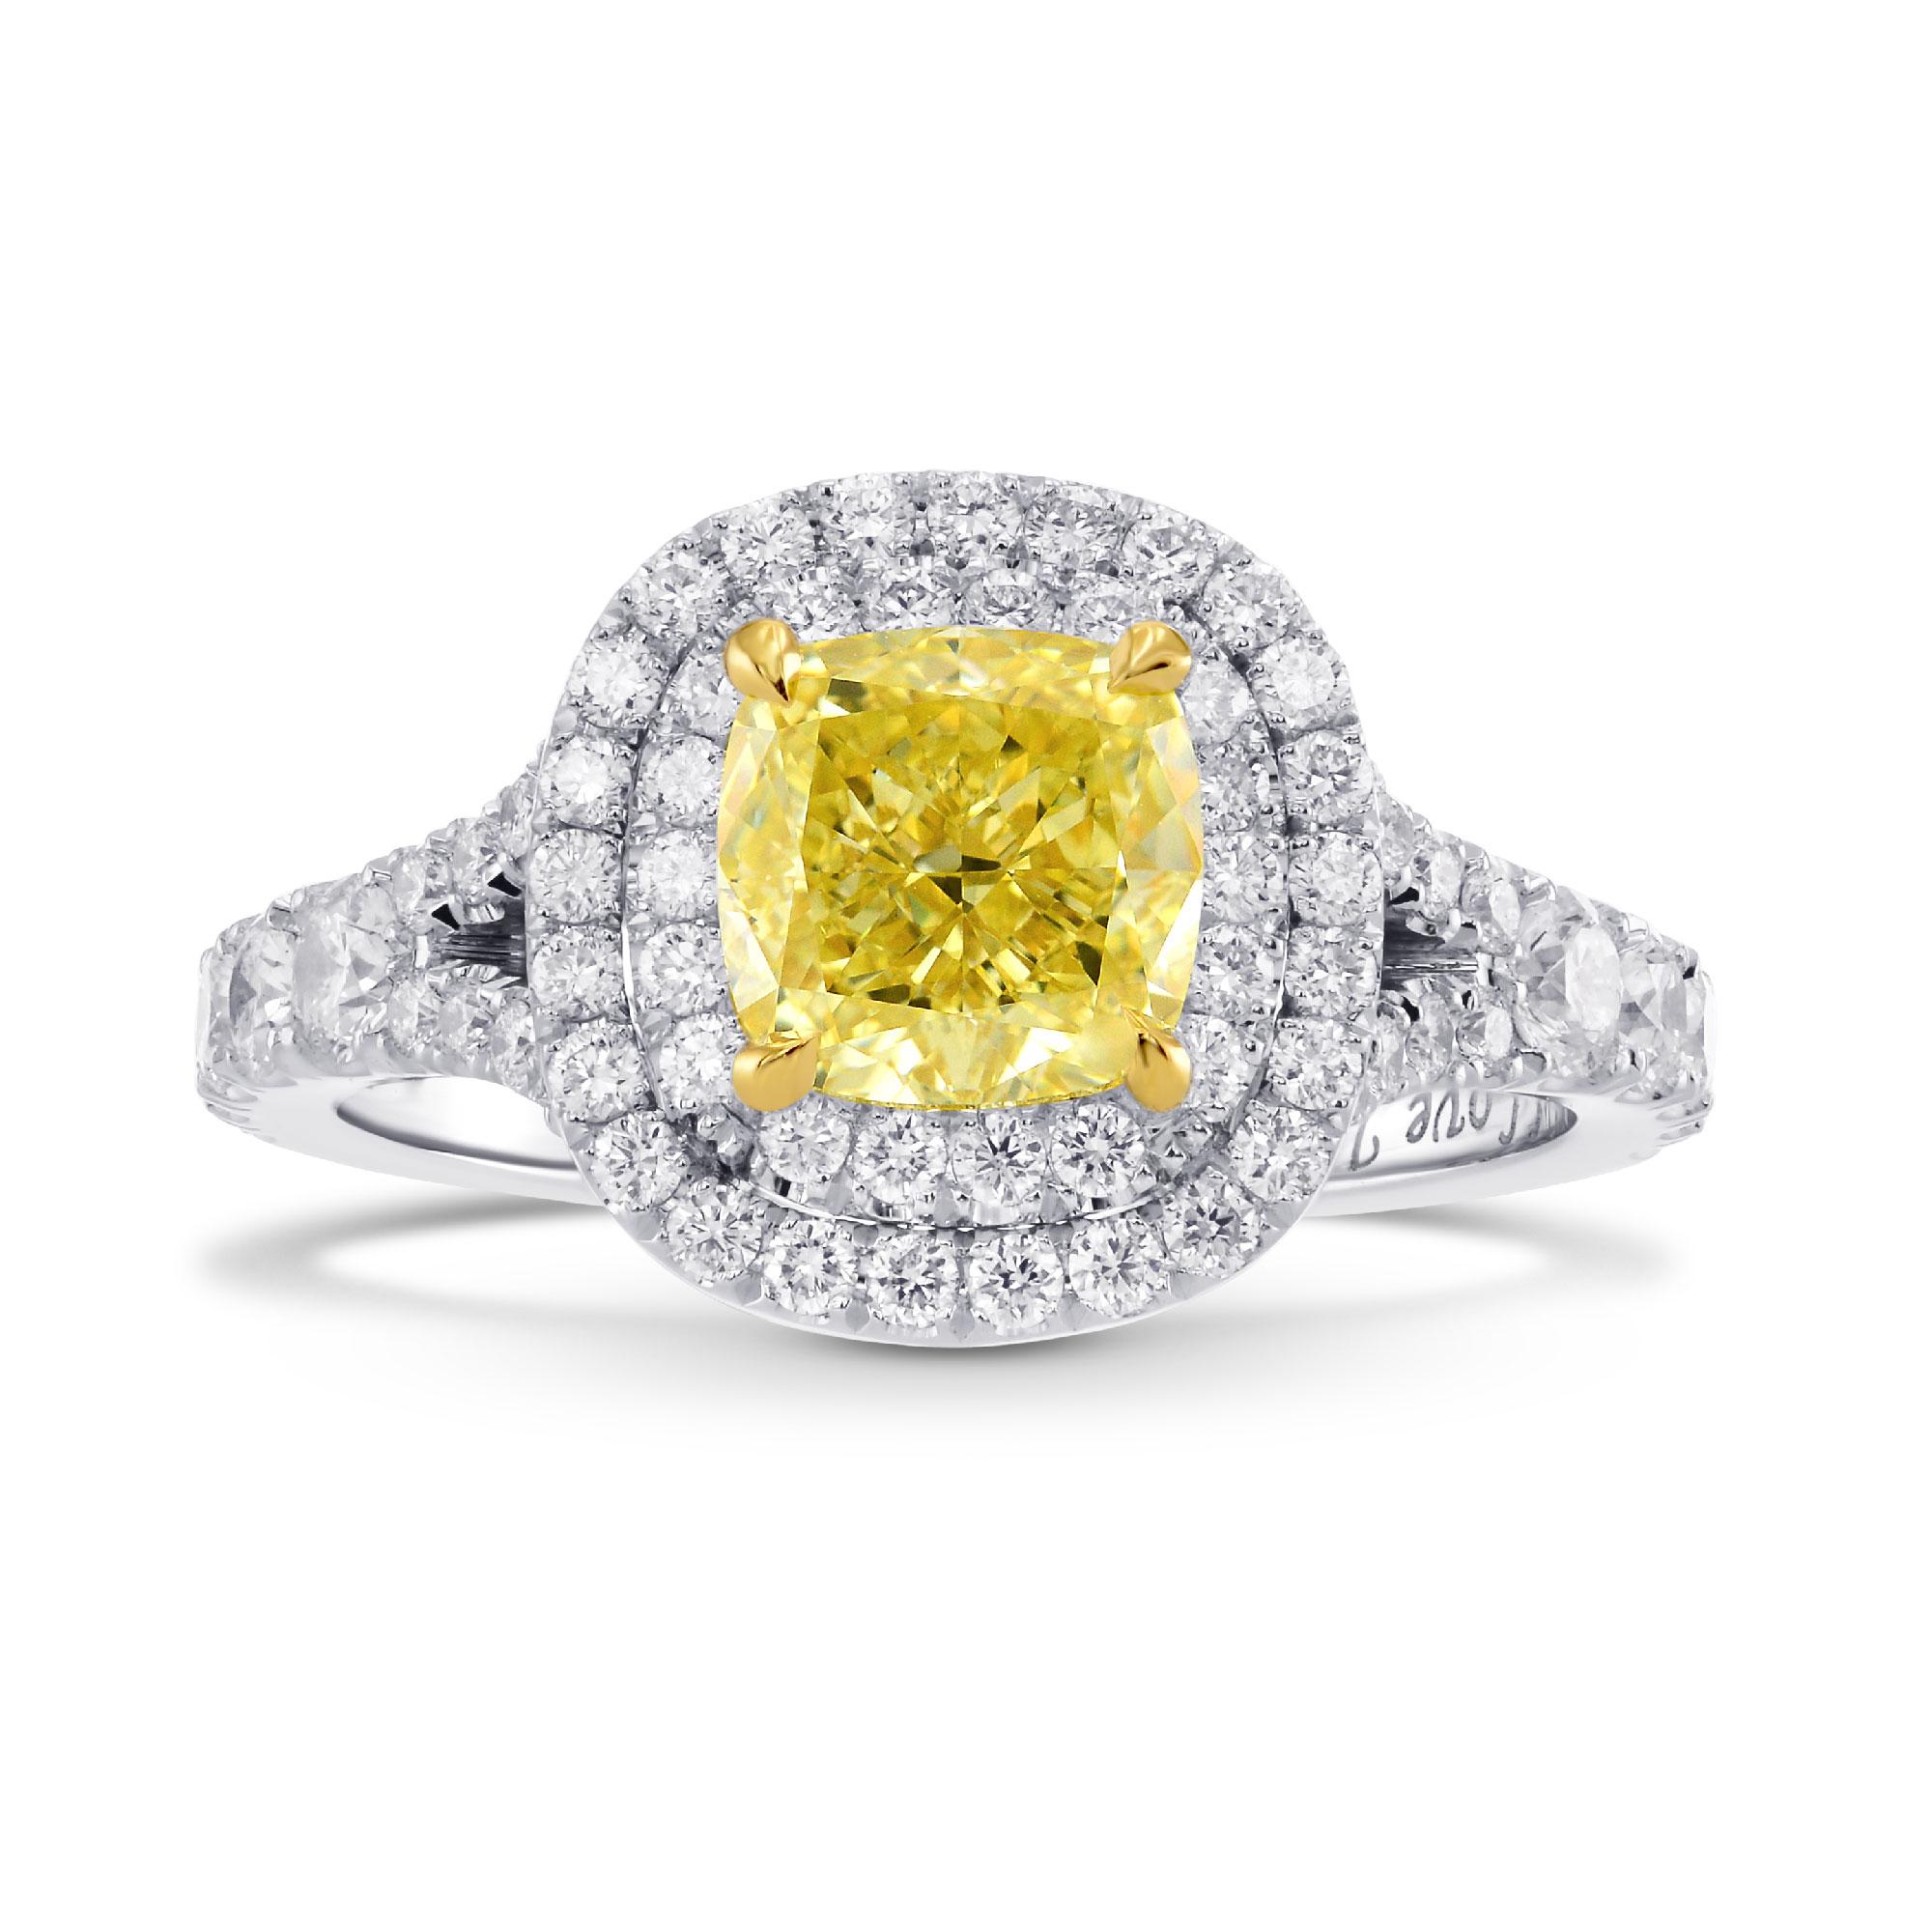 Fancy Intense Yellow Cushion Diamond Ring, SKU 281737 (2.19Ct TW)